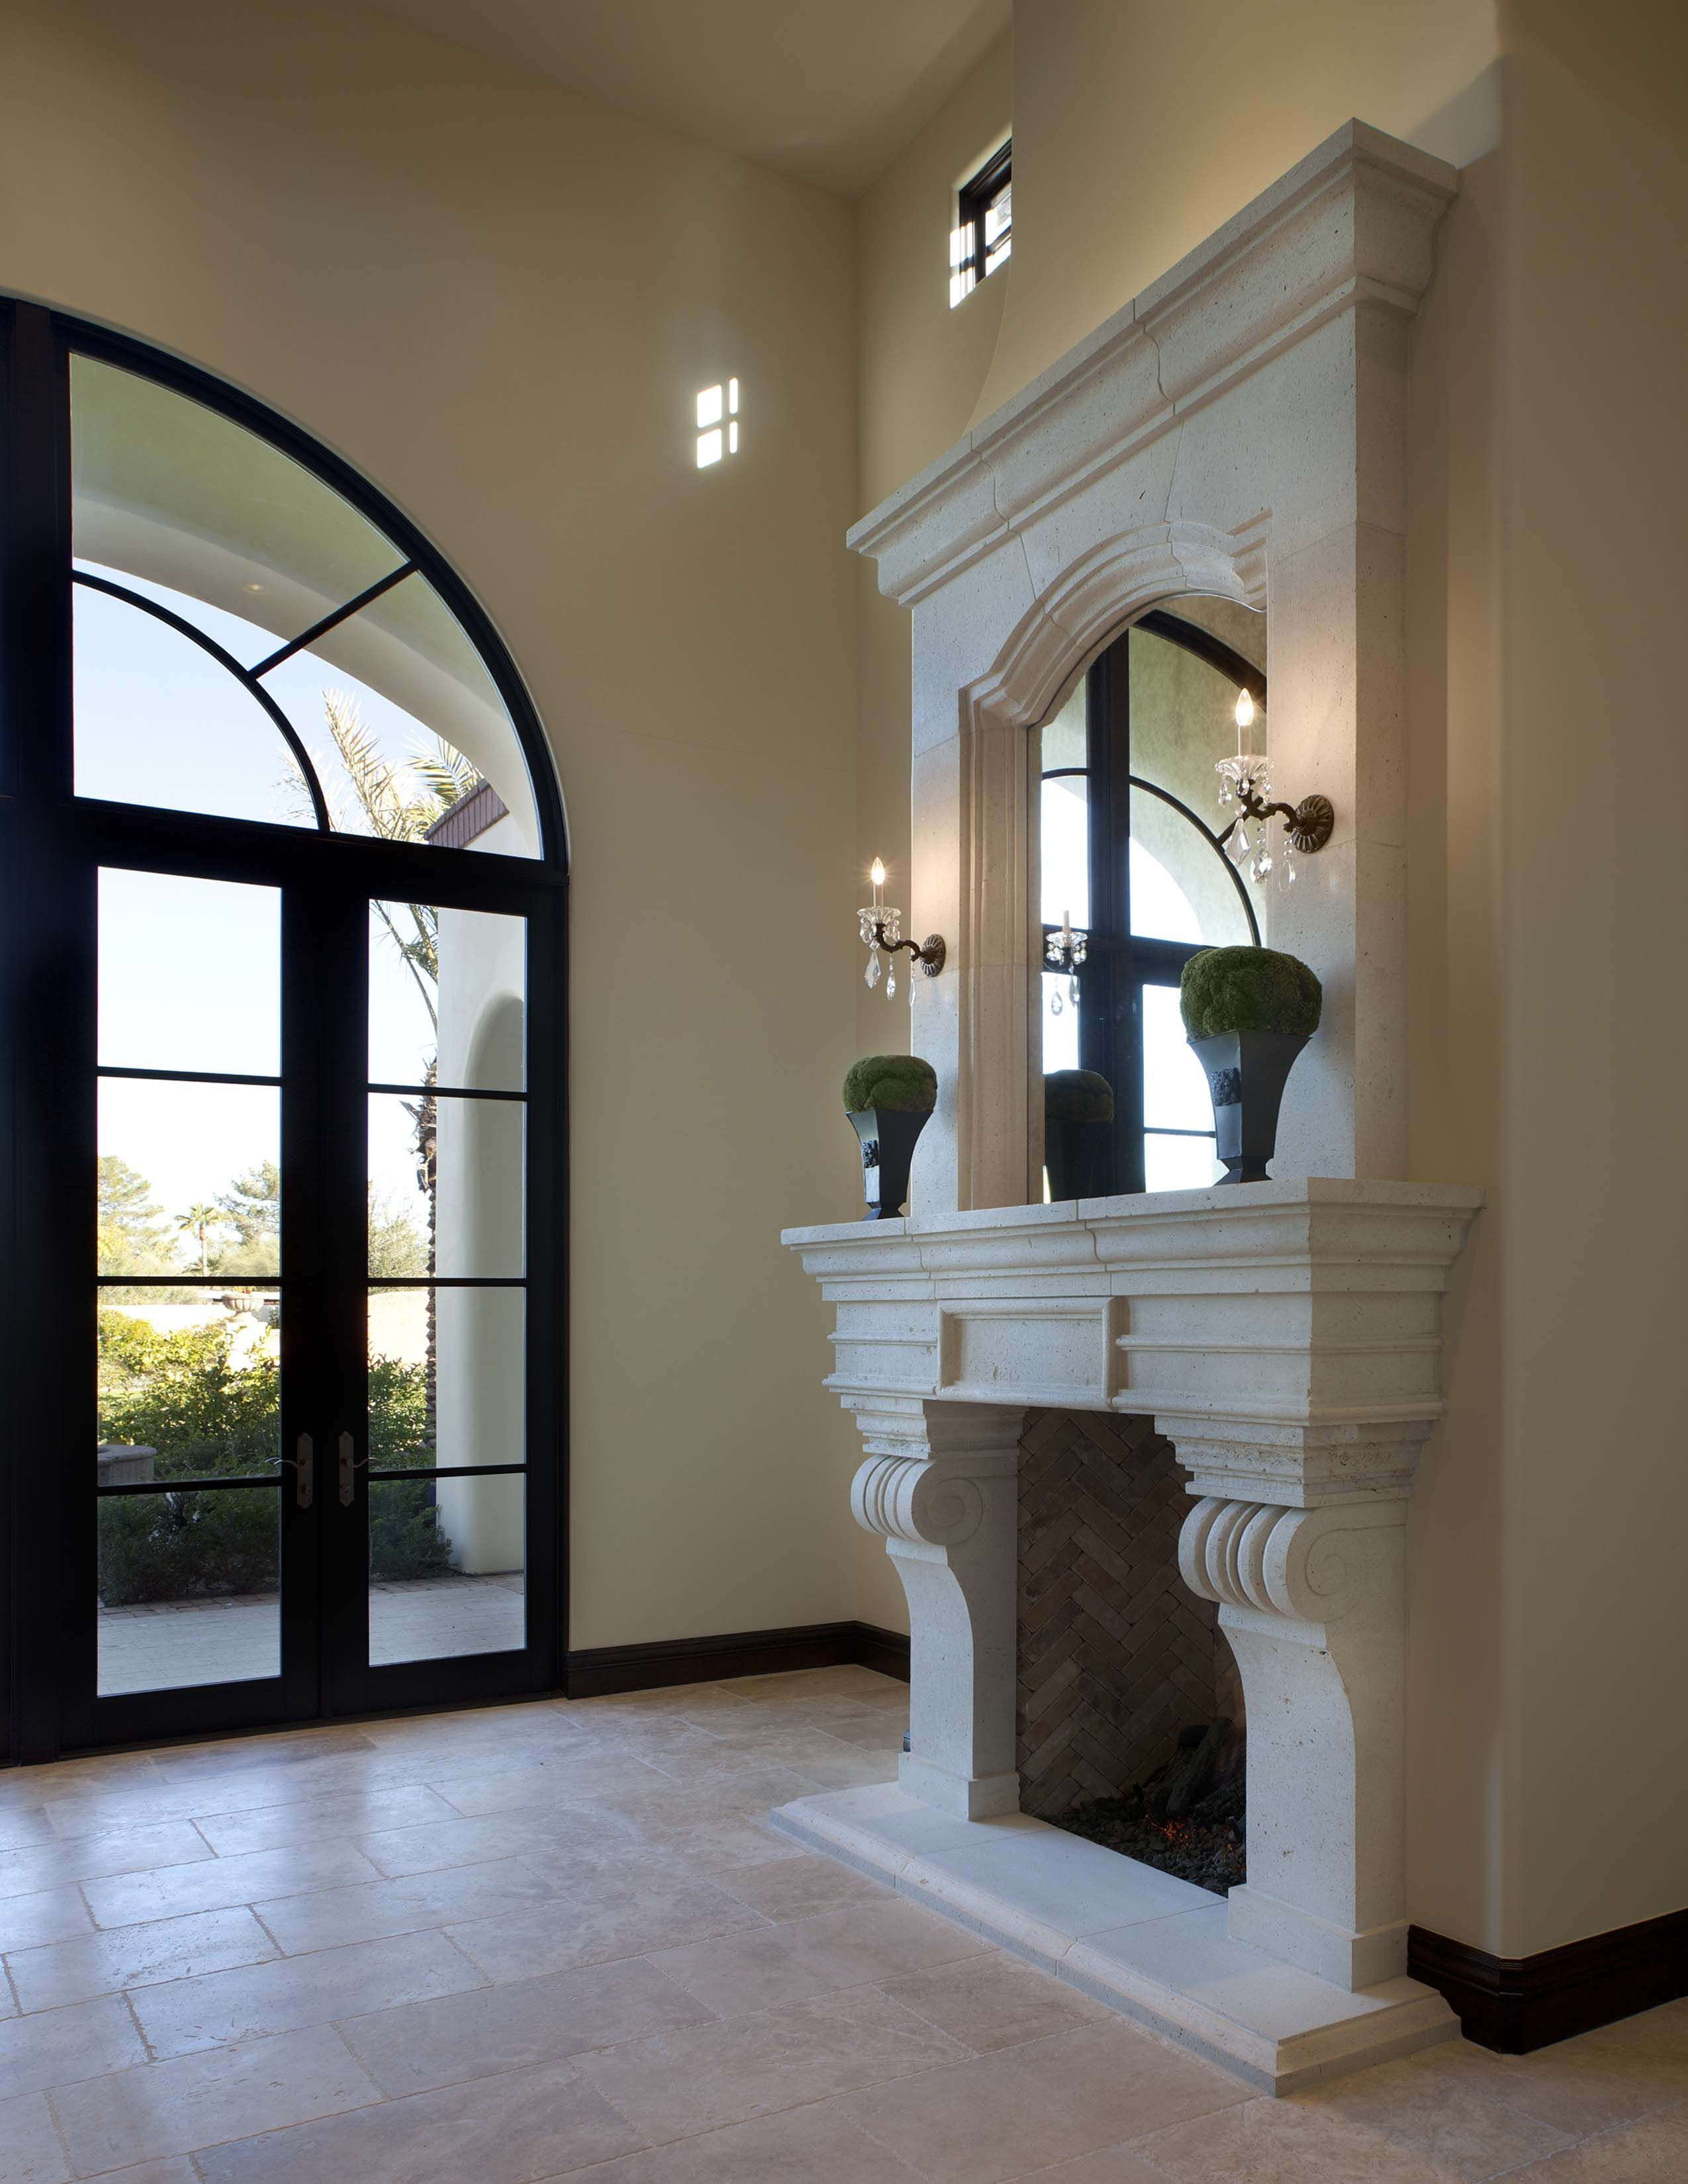 Custom Fireplace Design In A Santa Barbara Style Home In Paradise Valley Az I Plan Llc